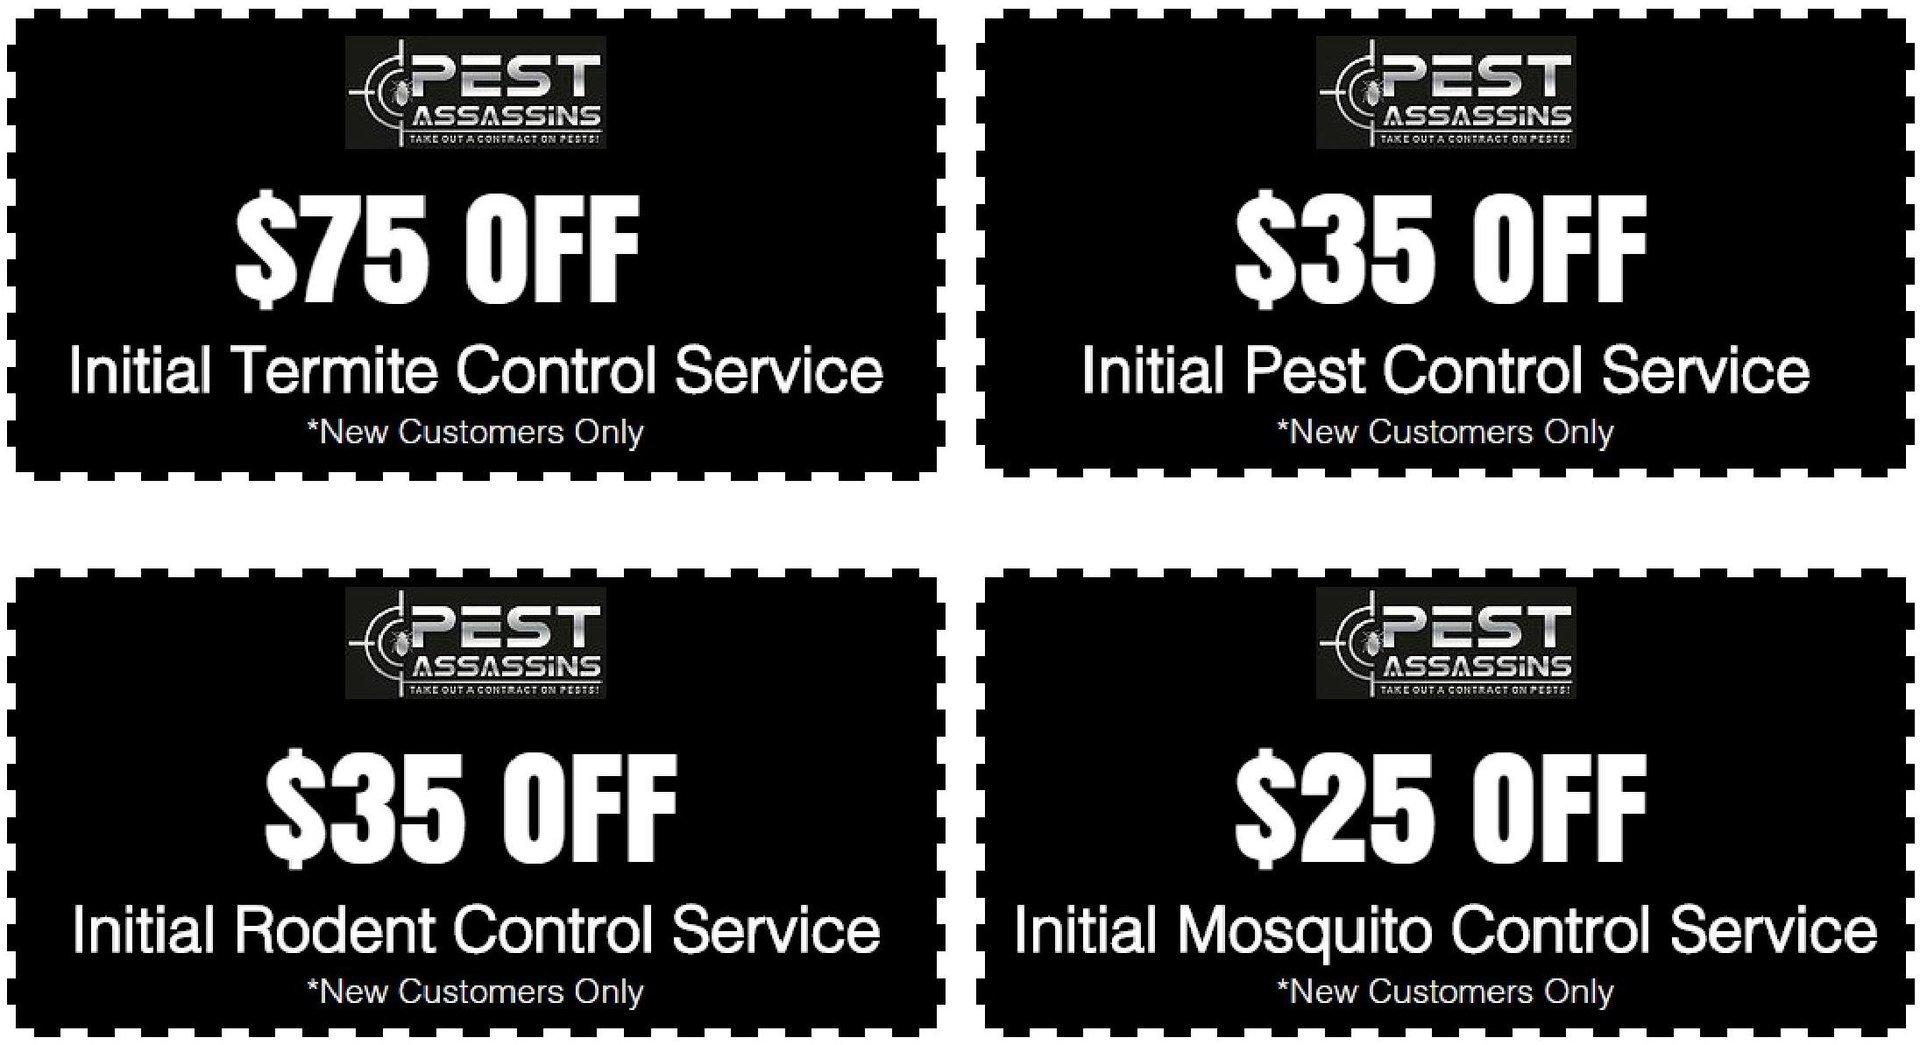 pest control coupons Mansfield North Attleboro Braintree